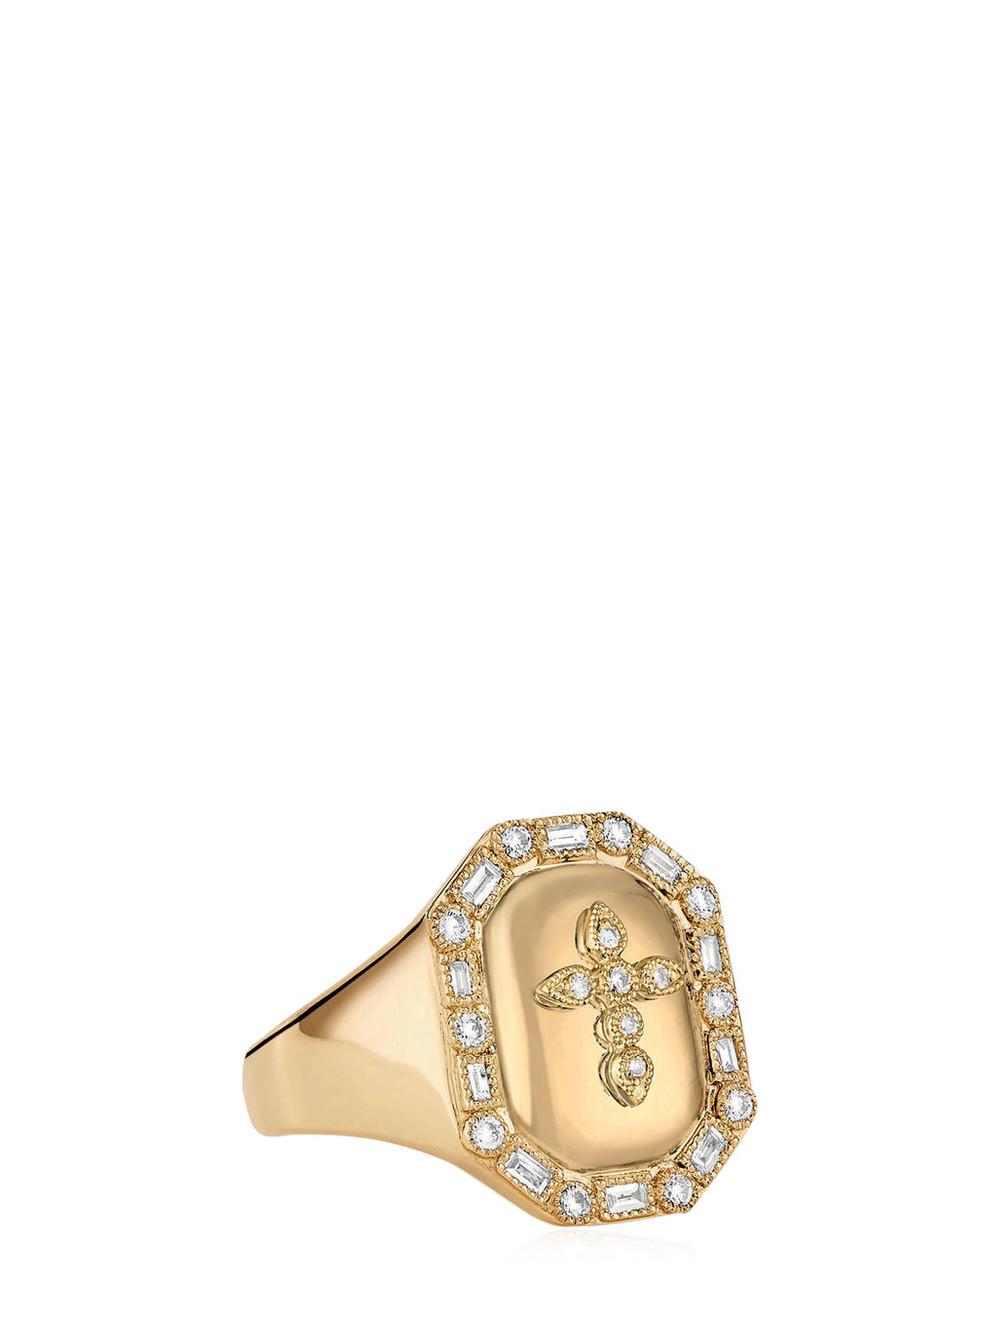 STONE PARIS Céleste Signet Ring in gold